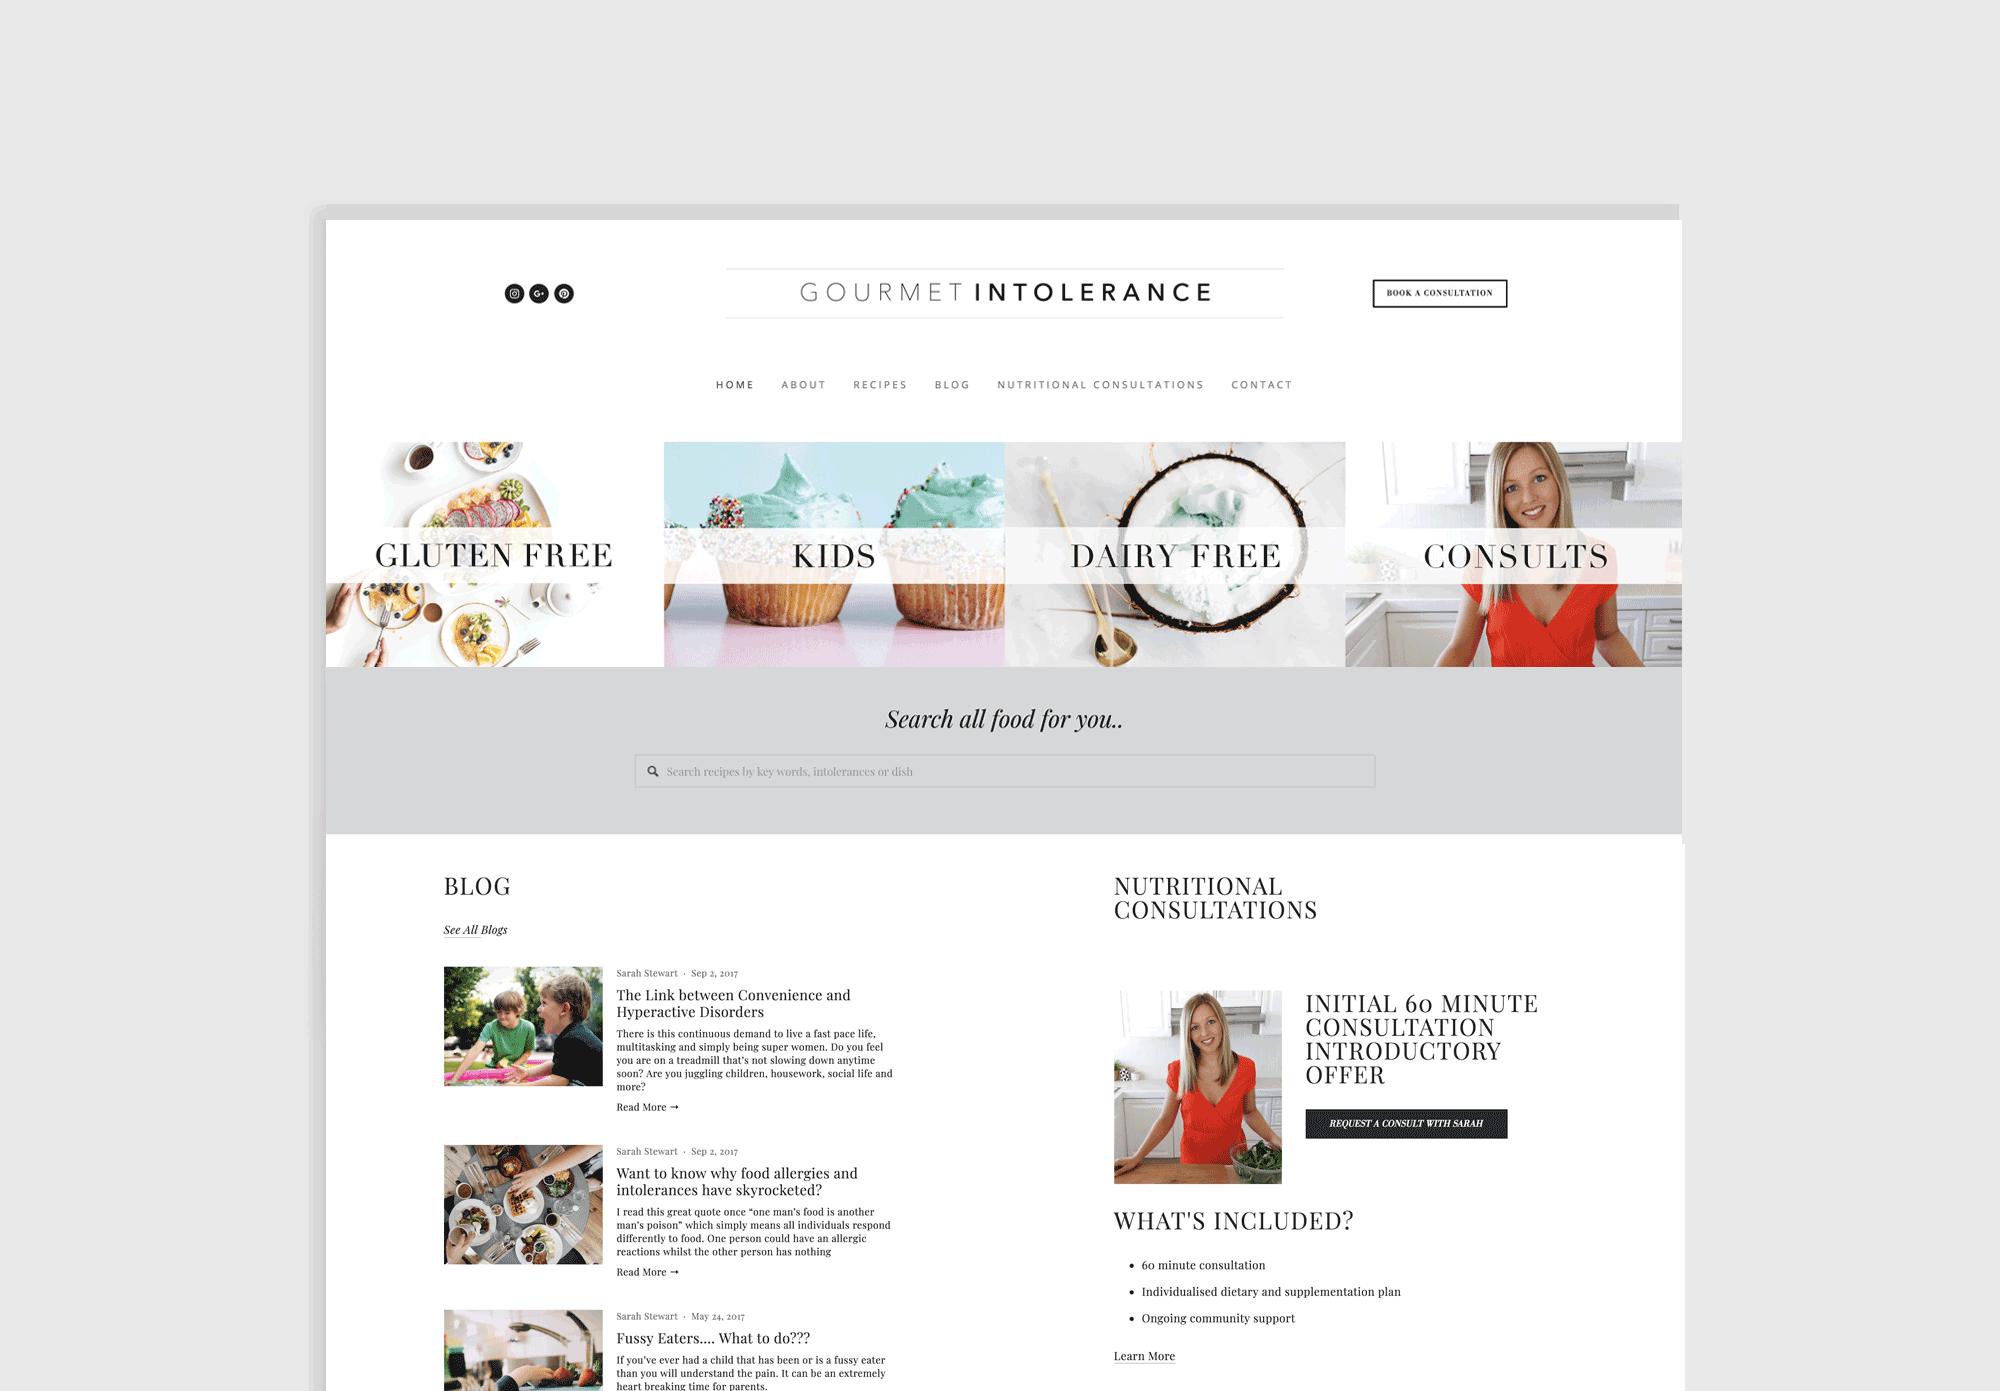 shopify e-commerce website design and development